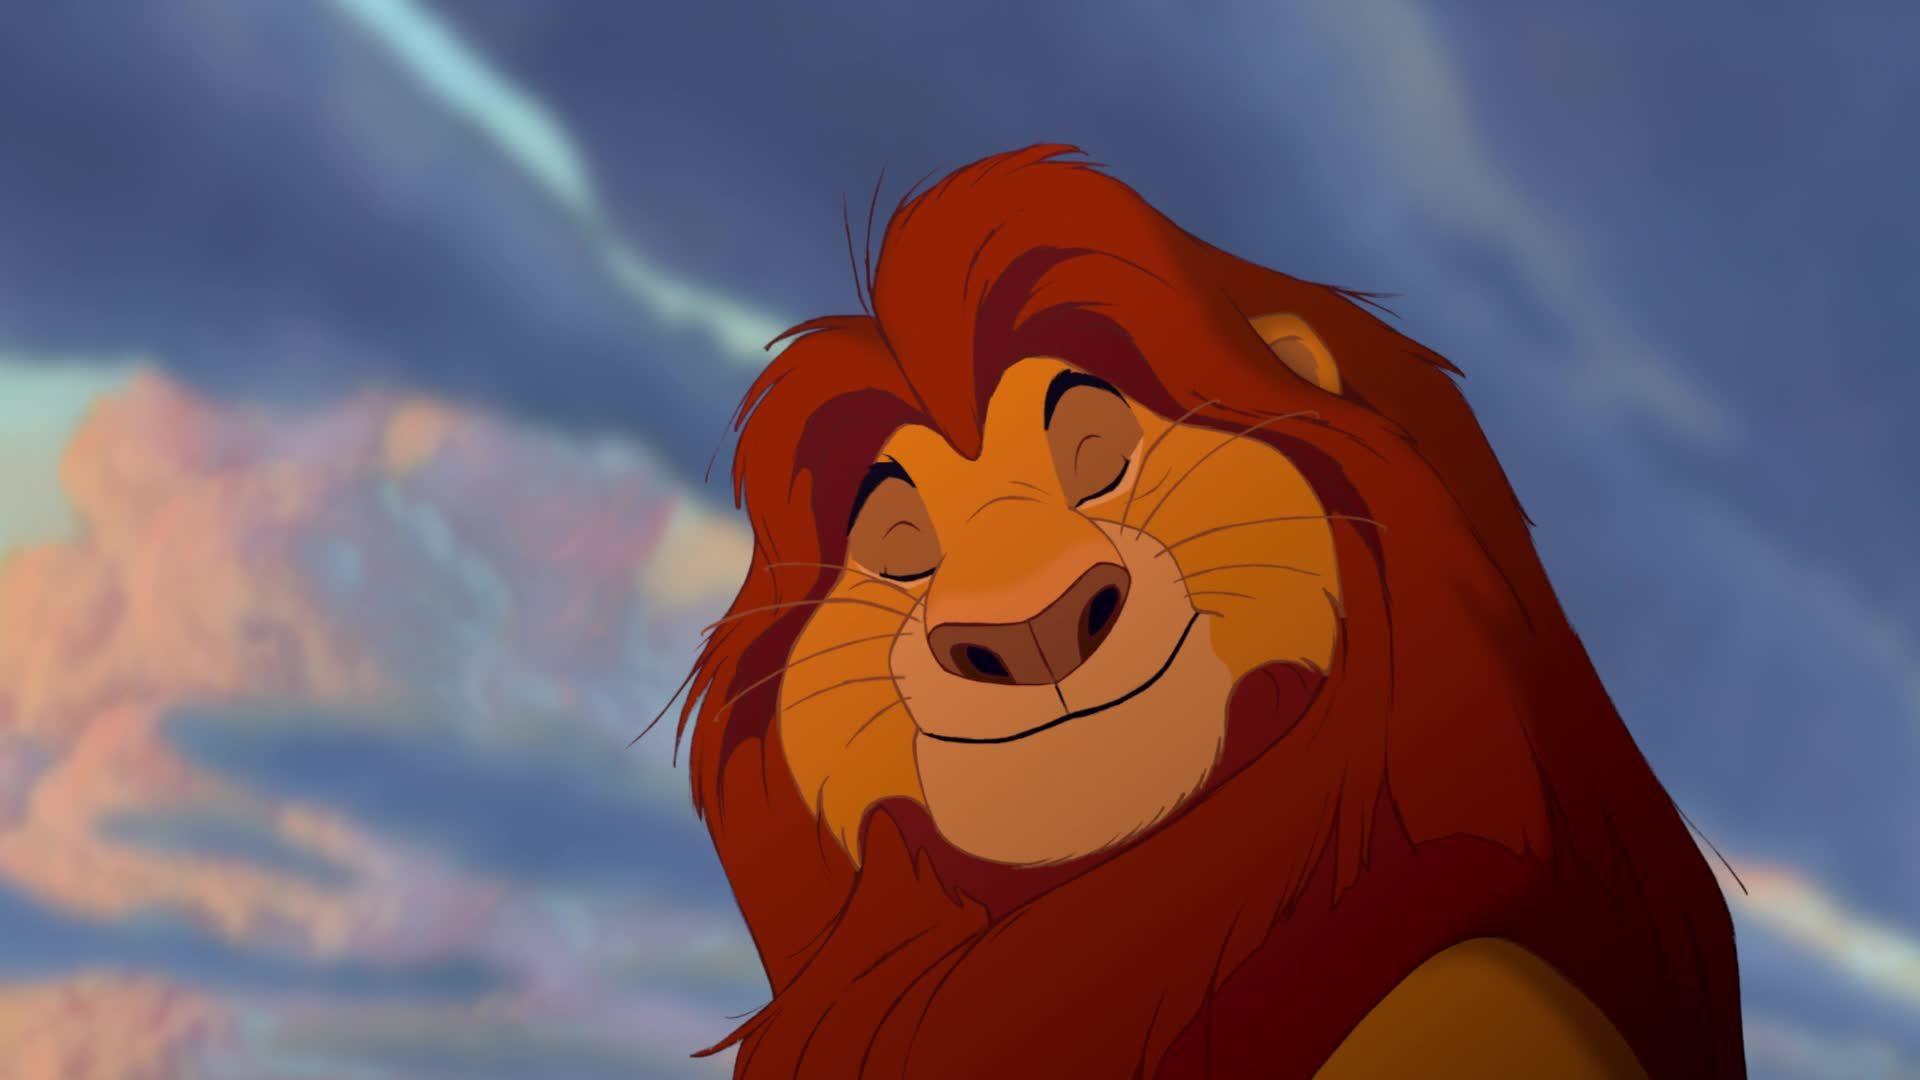 The Lion King picture The lion king 1994, Lion king